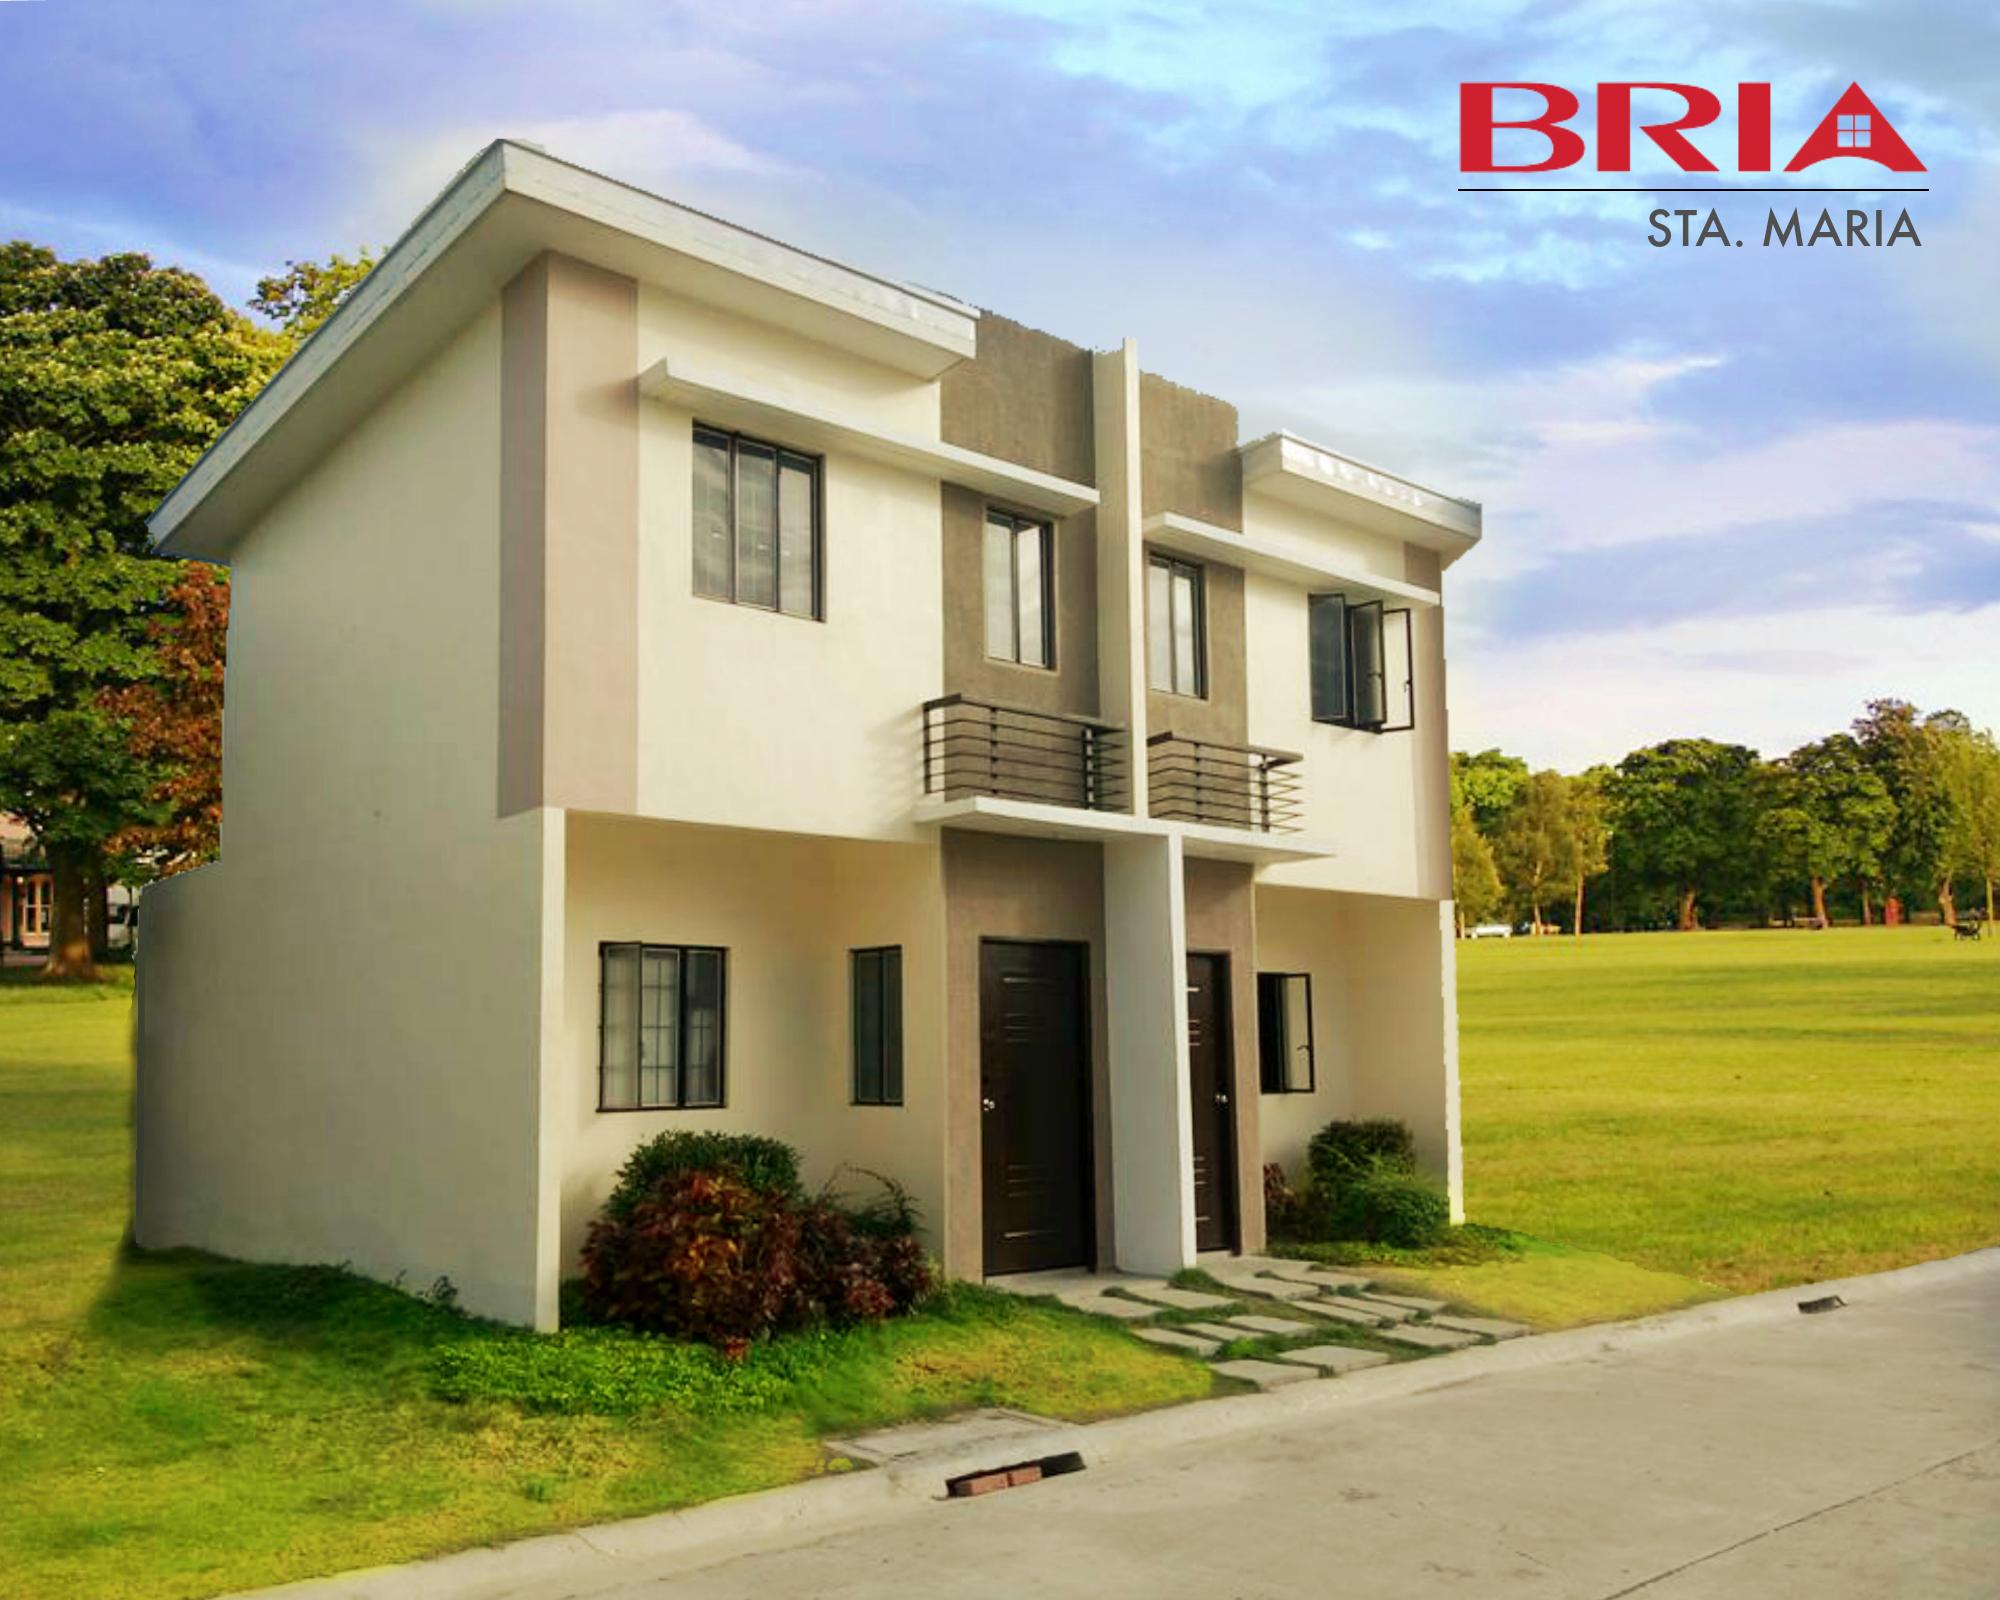 Angeli Duplex Bria Homes Sta Maria Bulacan Bulacanhomes